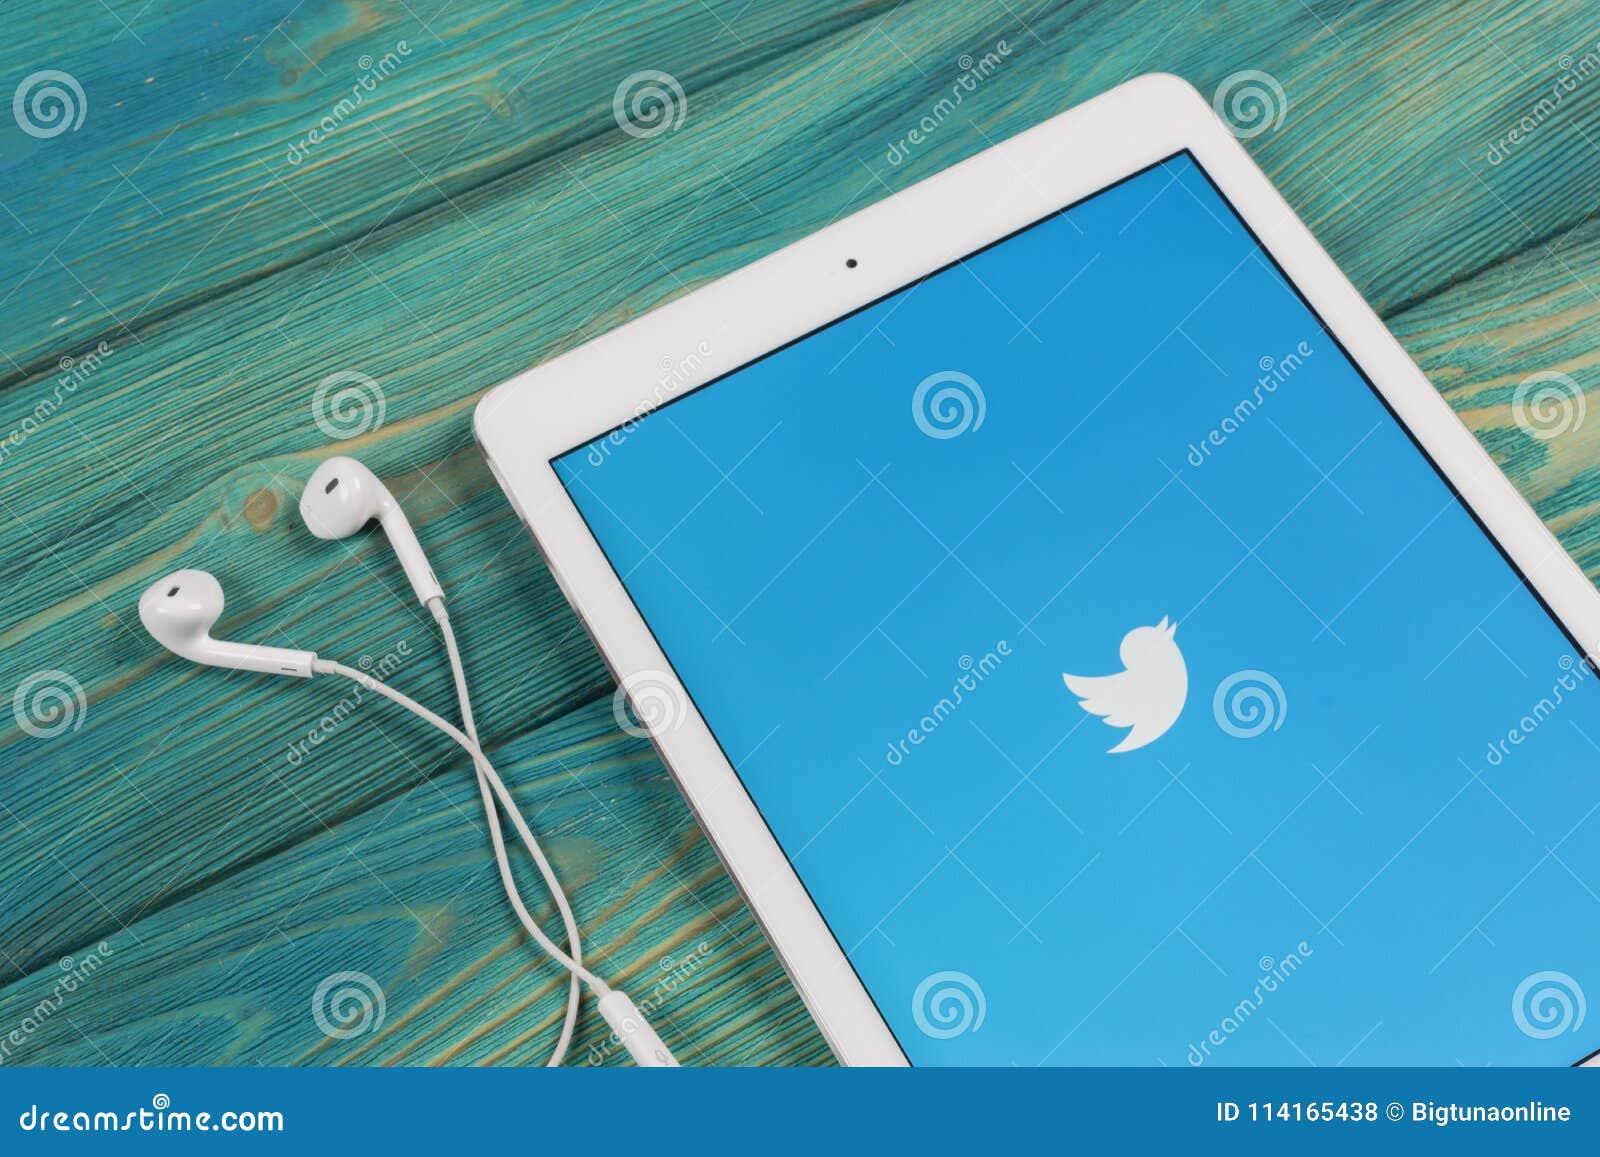 Twitter Application Icon On Apple IPad Smartphone Screen